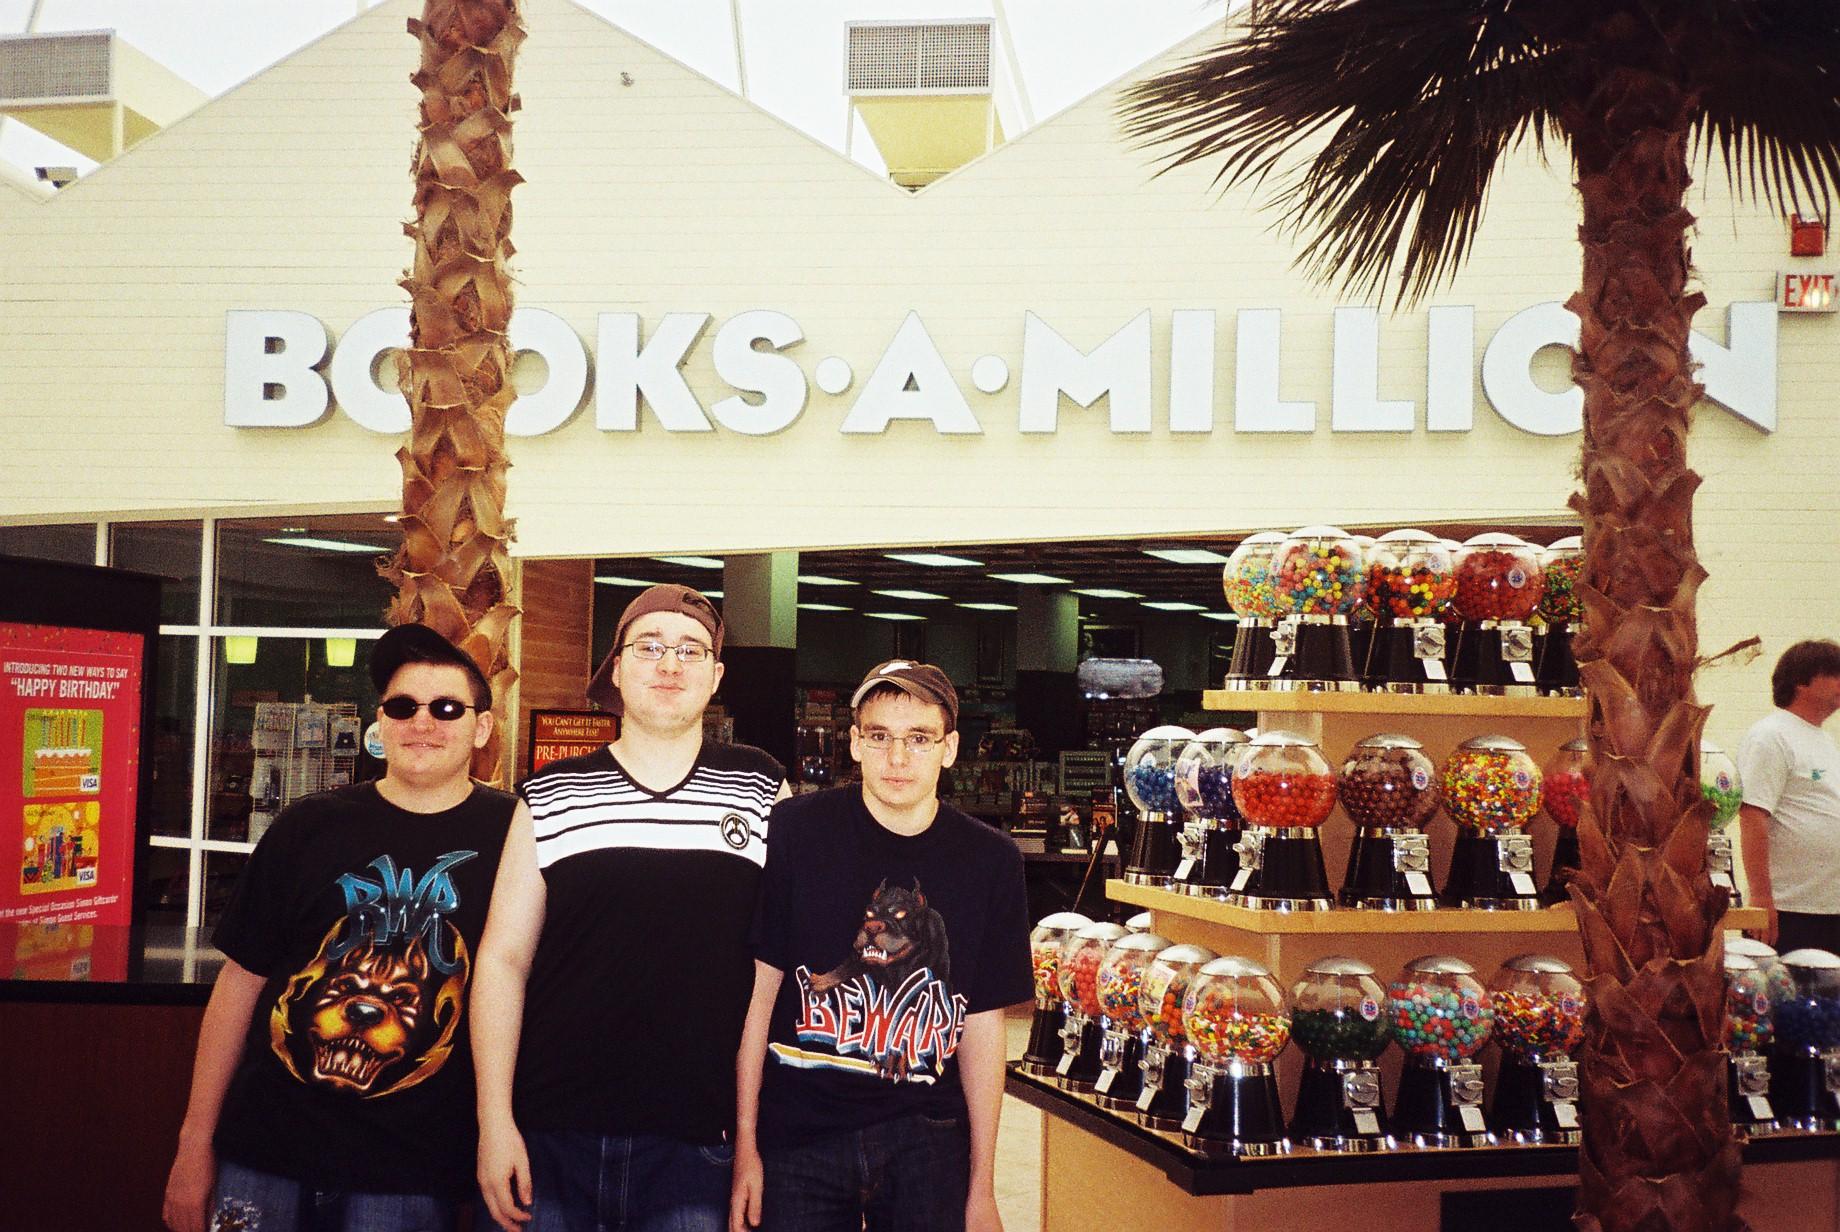 sunrise books a million sawgrass mills mall my boys Aug09